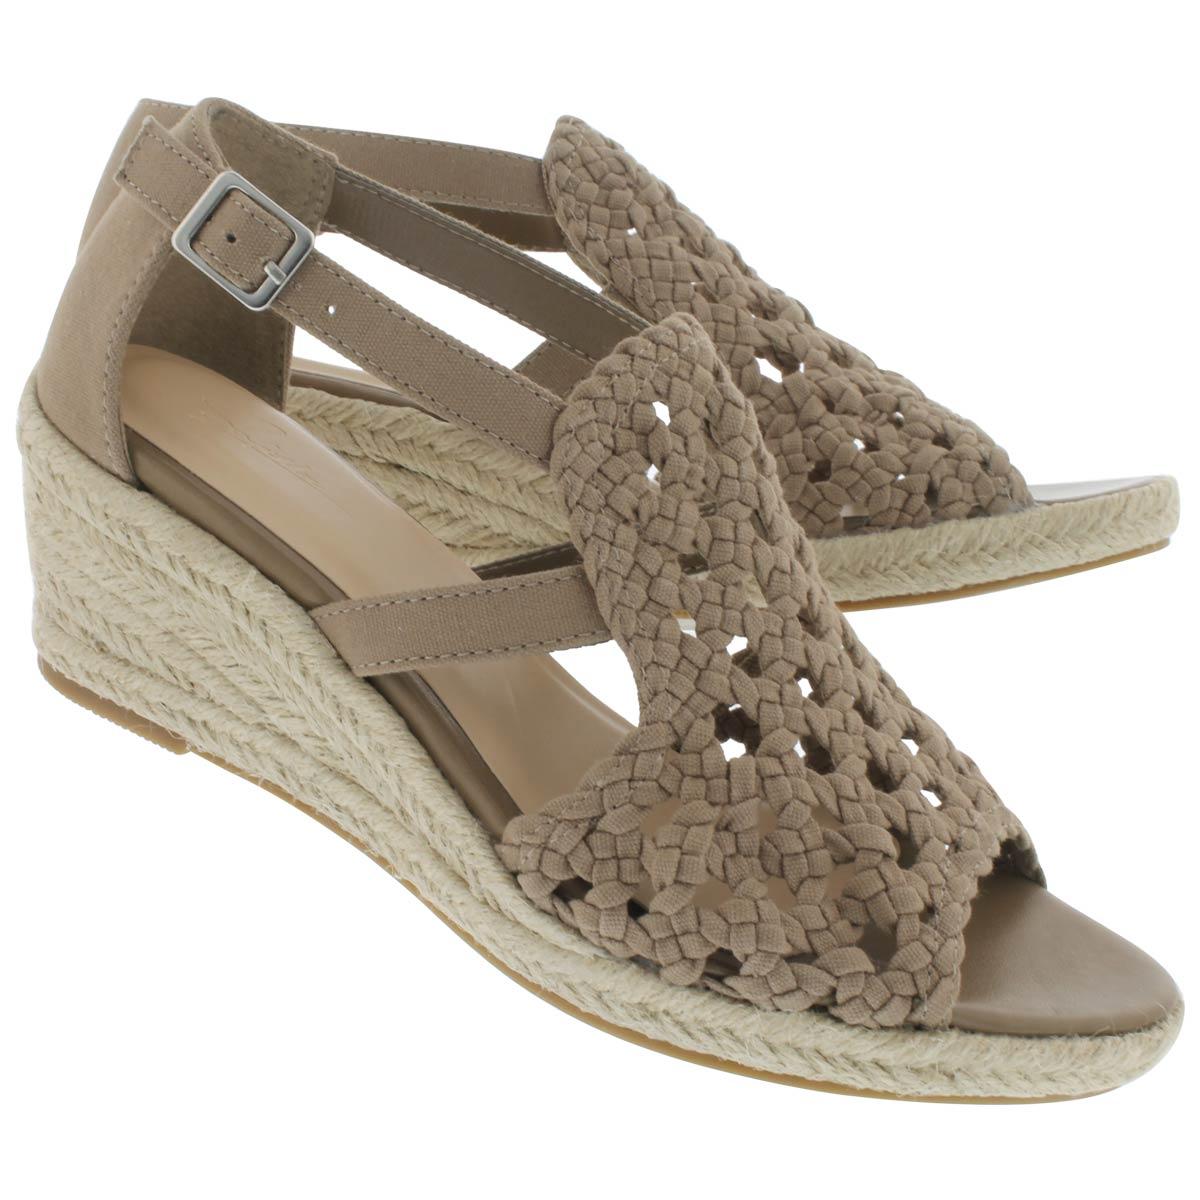 Sandale comp kaki EMMY 2, fem